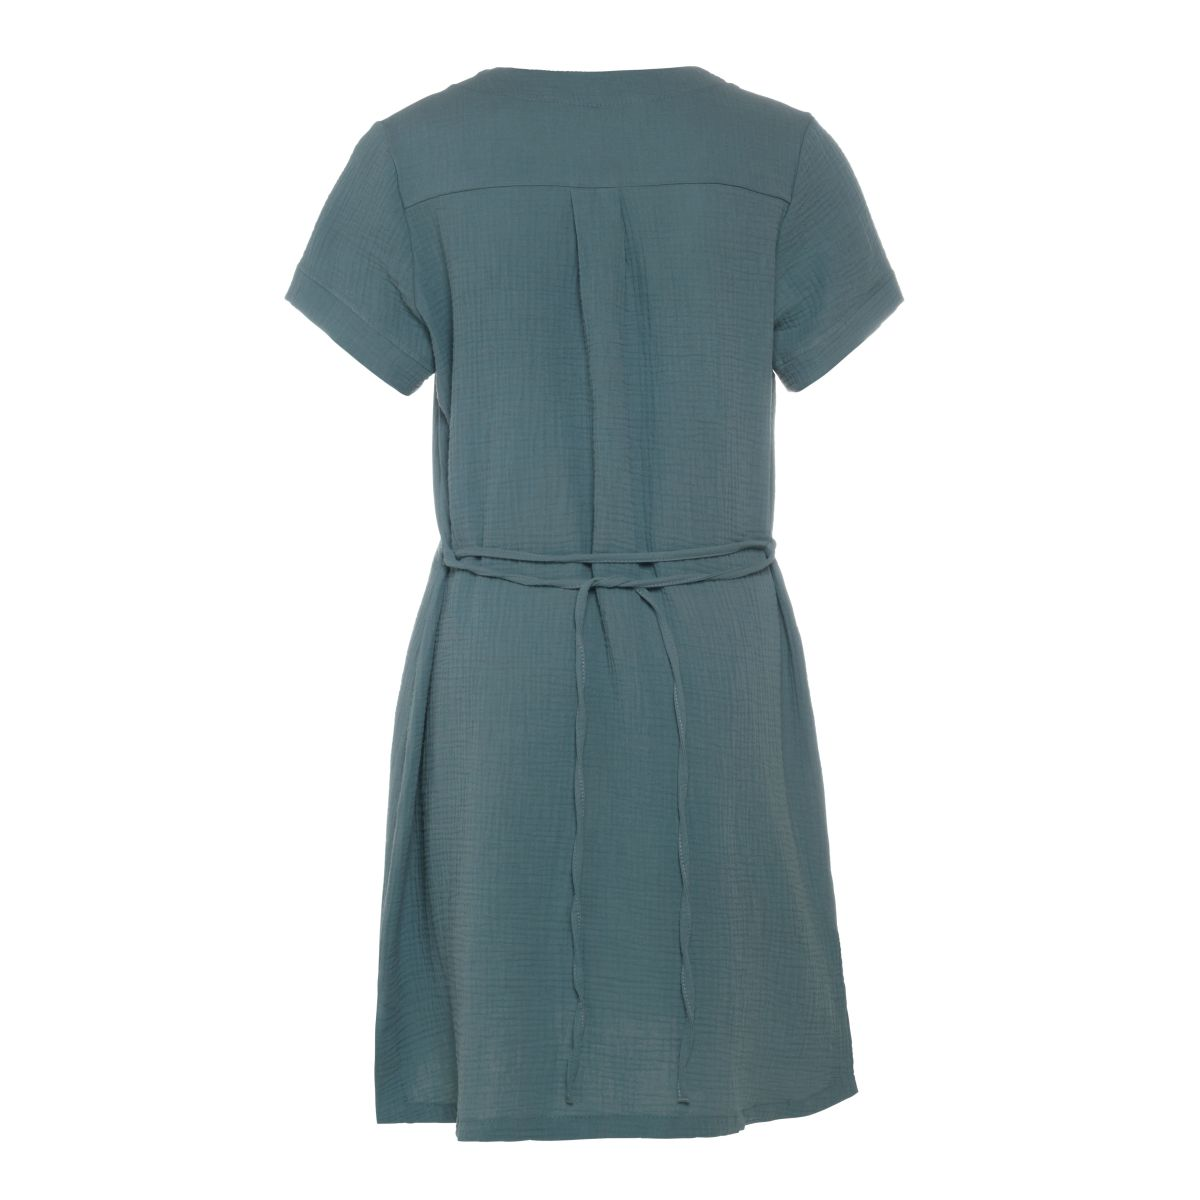 knit factory kf15012000950 indy jurk stone green m 2